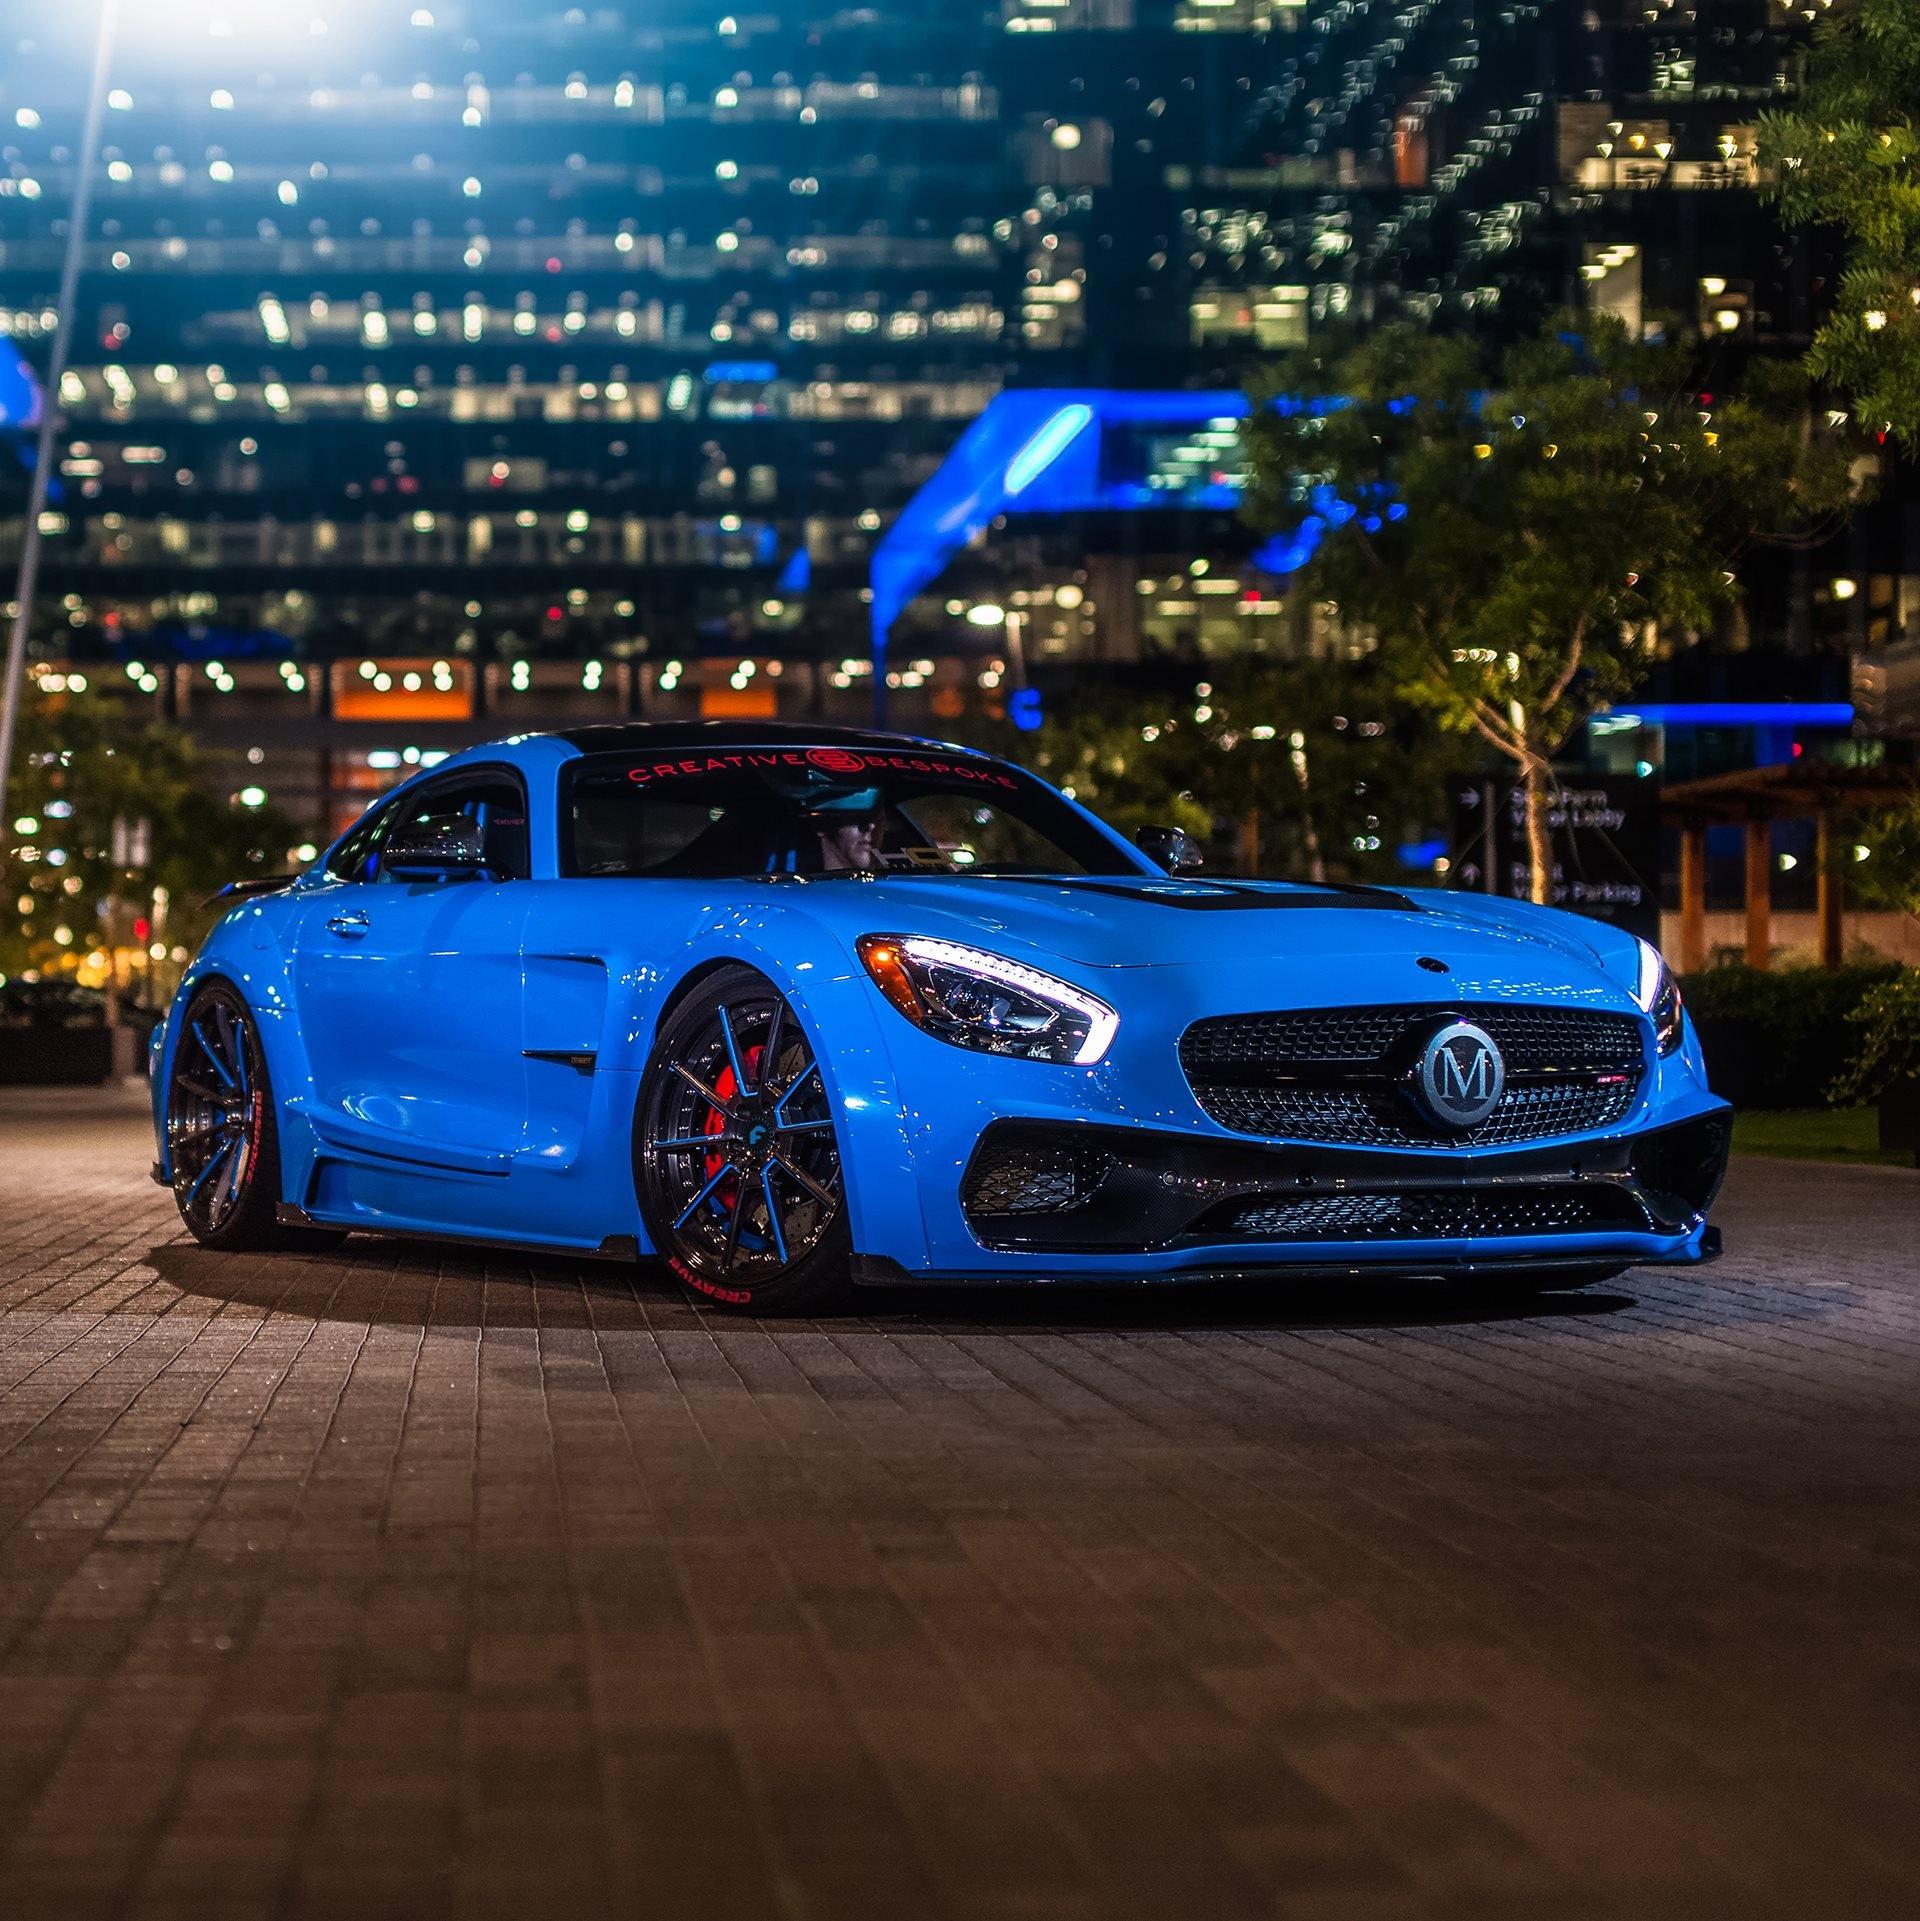 Custom Body Kit On Blue Mercedes Amg Gt Photo By Forgiato